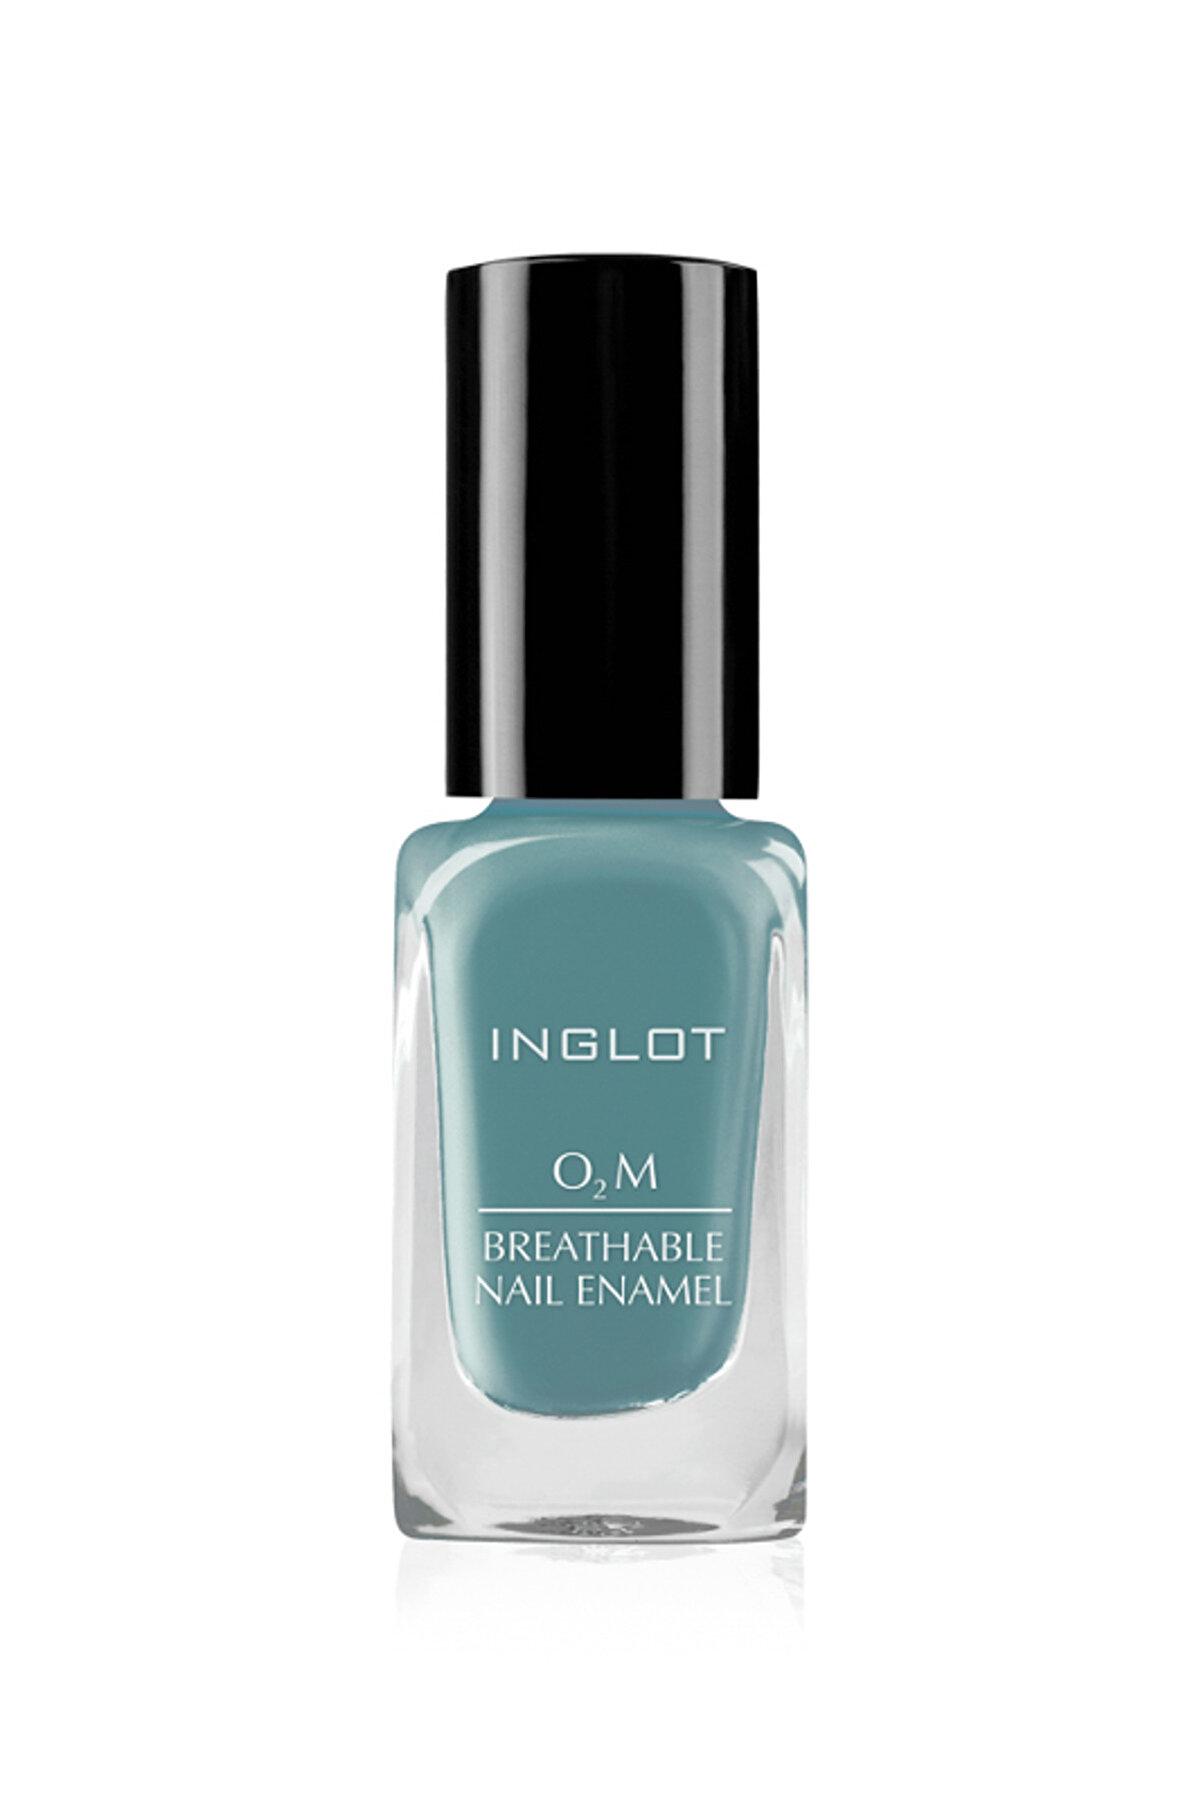 Inglot Oje - O2M Breathable Nail Enamel 430 11 ml 5907587114302